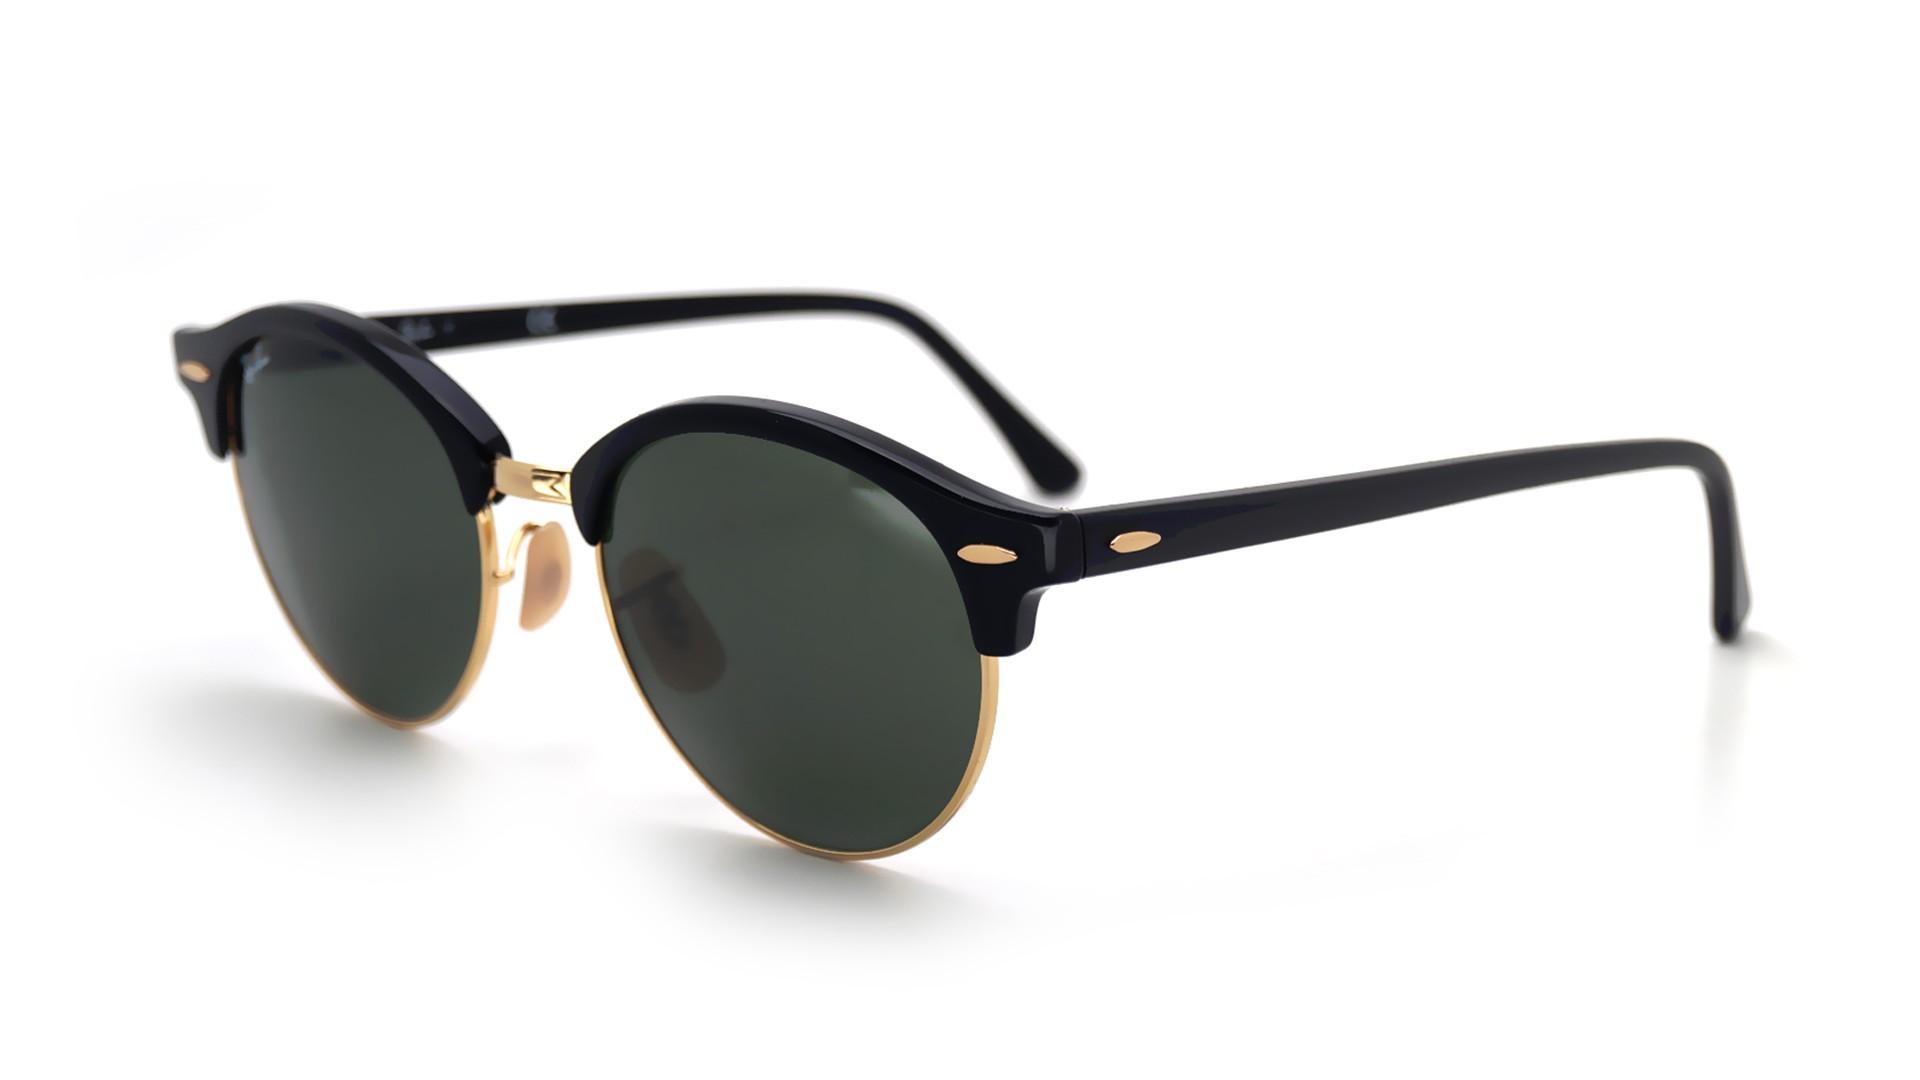 ec7088972b34 Sunglasses Ray-Ban Clubround Black G15 RB4246 901 51-19 Medium